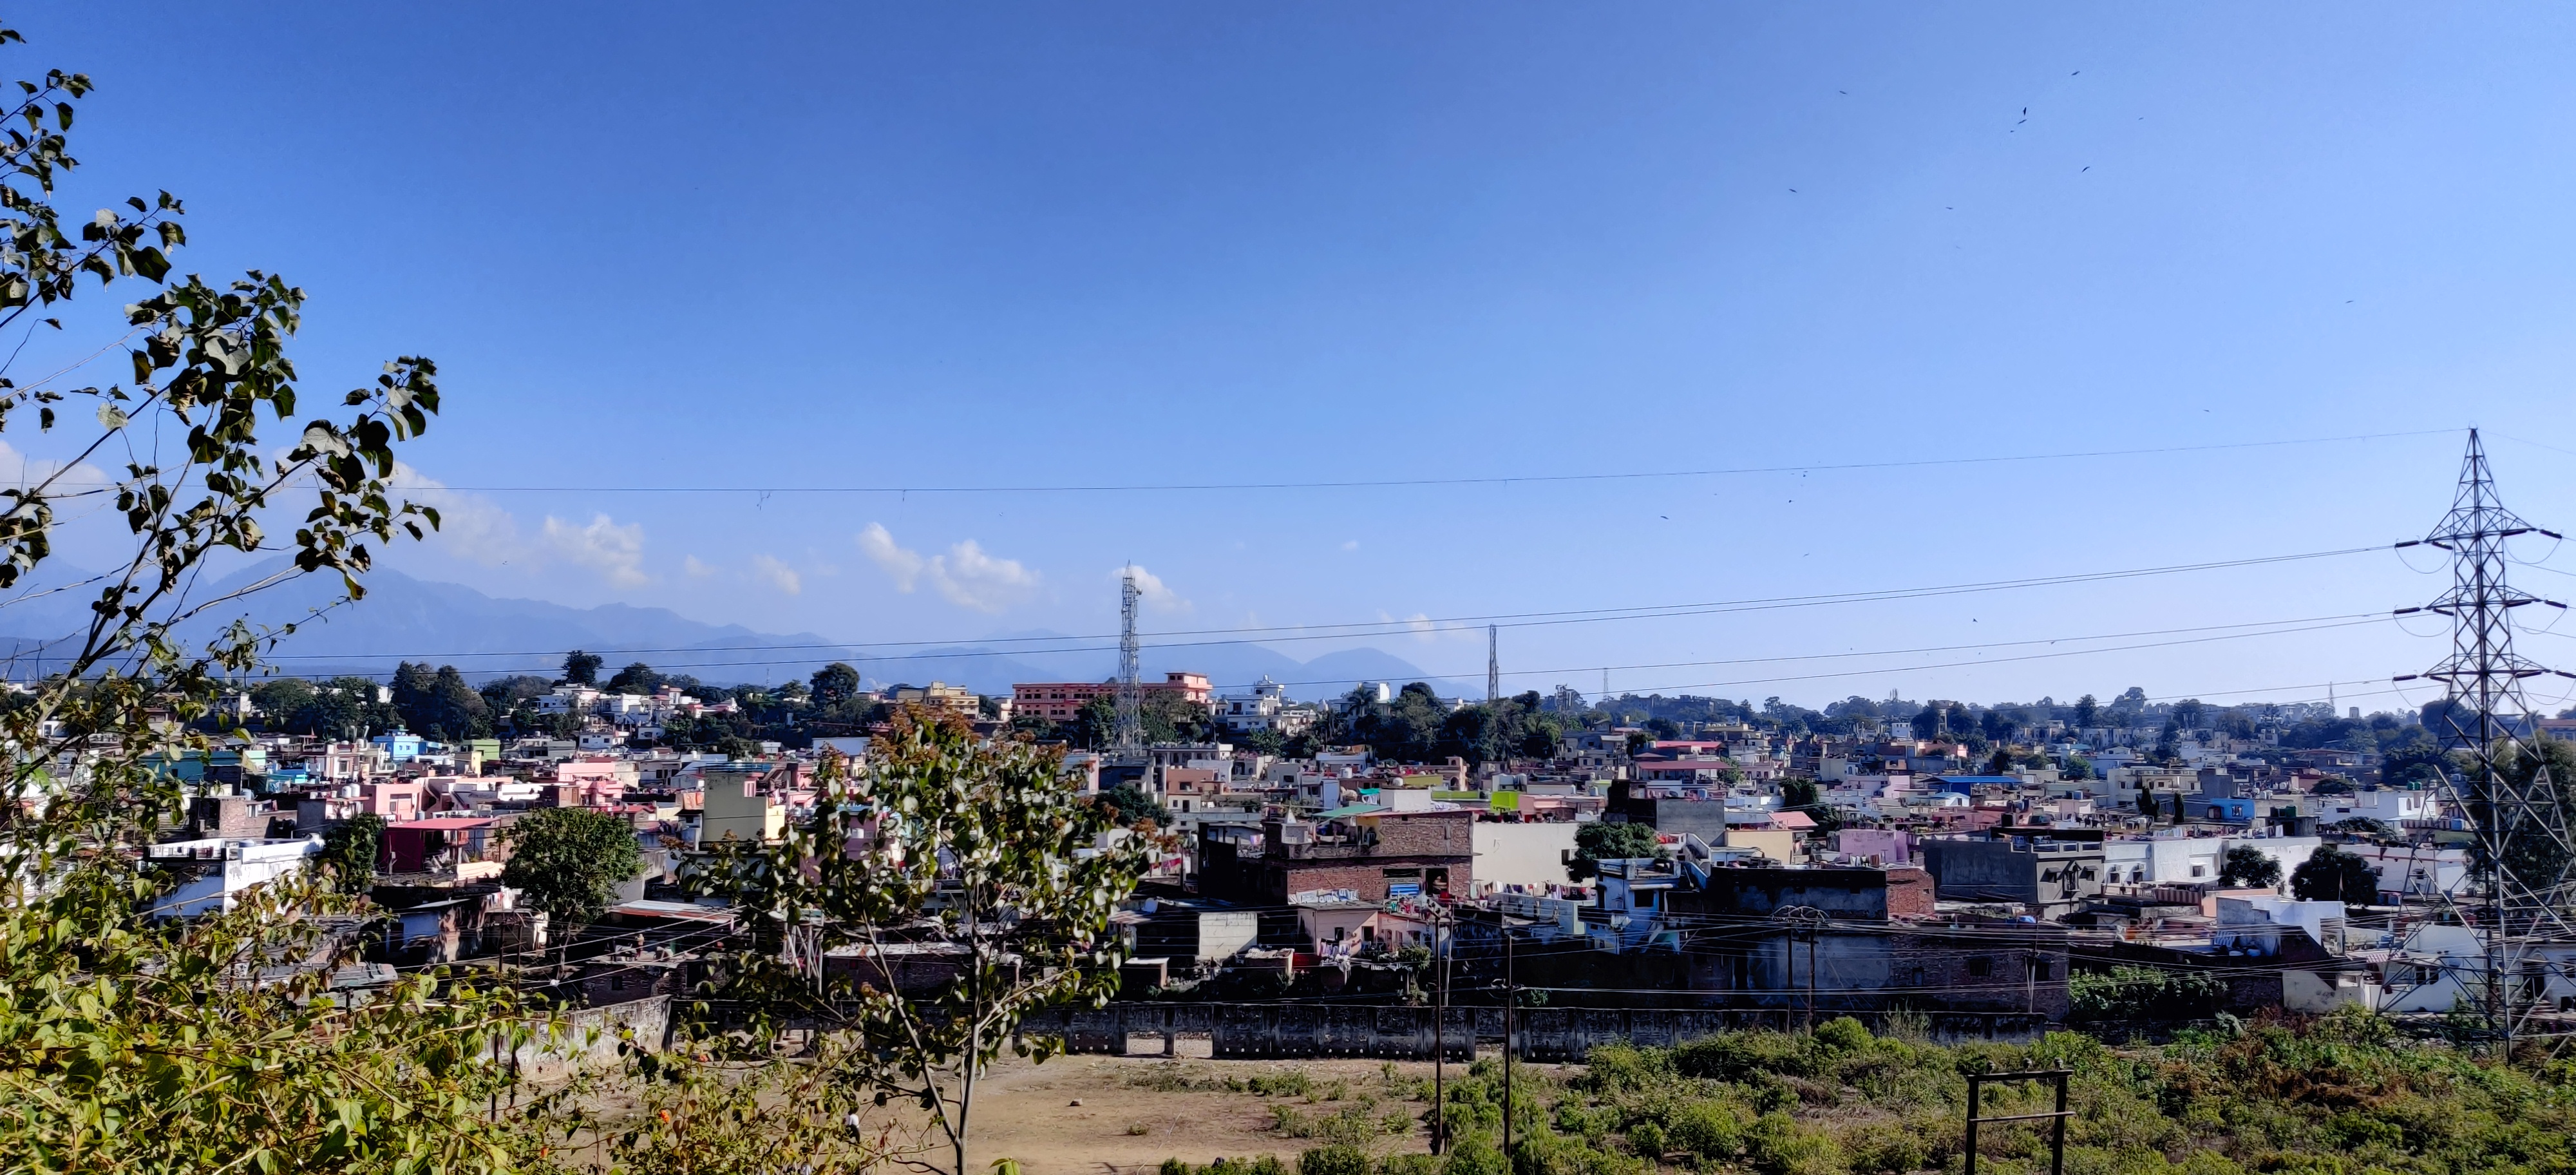 File:Dehradun Cantt Skyline 02.jpg - Wikimedia Commons,देहरादून का इतिहास